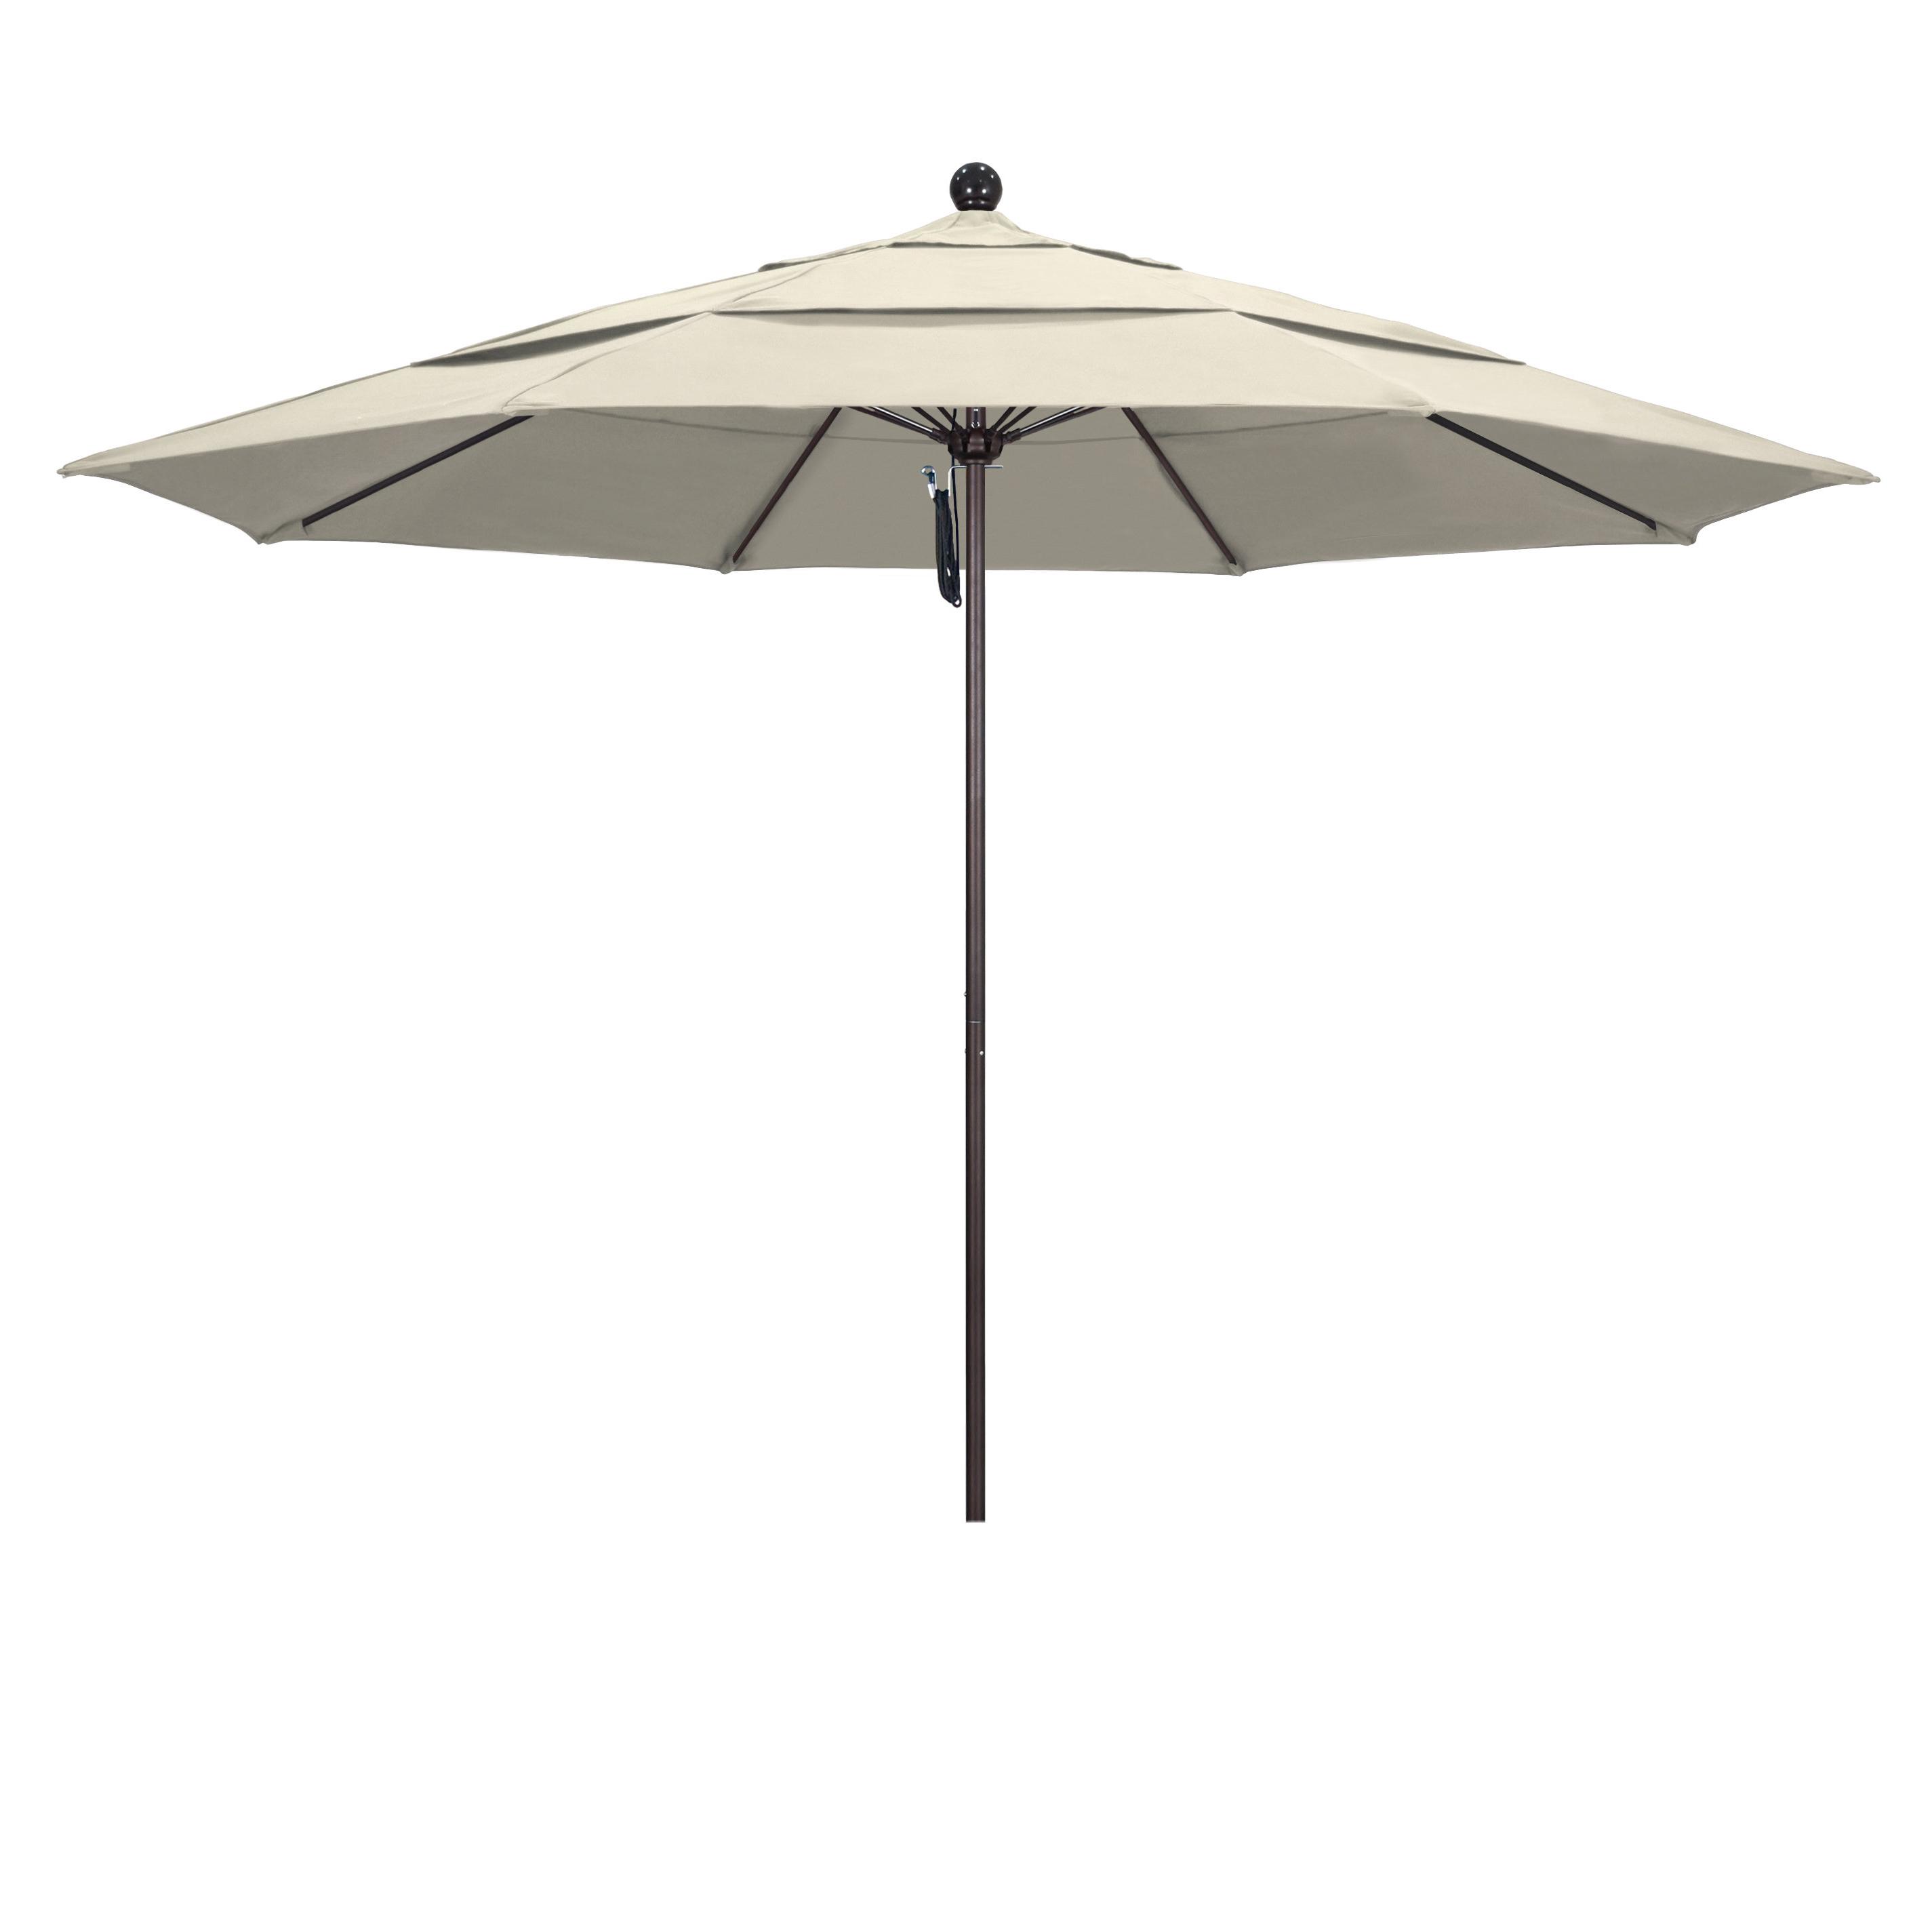 Recent Mucci Madilyn Market Sunbrella Umbrellas With Regard To Sol 72 Outdoor Duxbury 11' Market Umbrella (View 18 of 20)